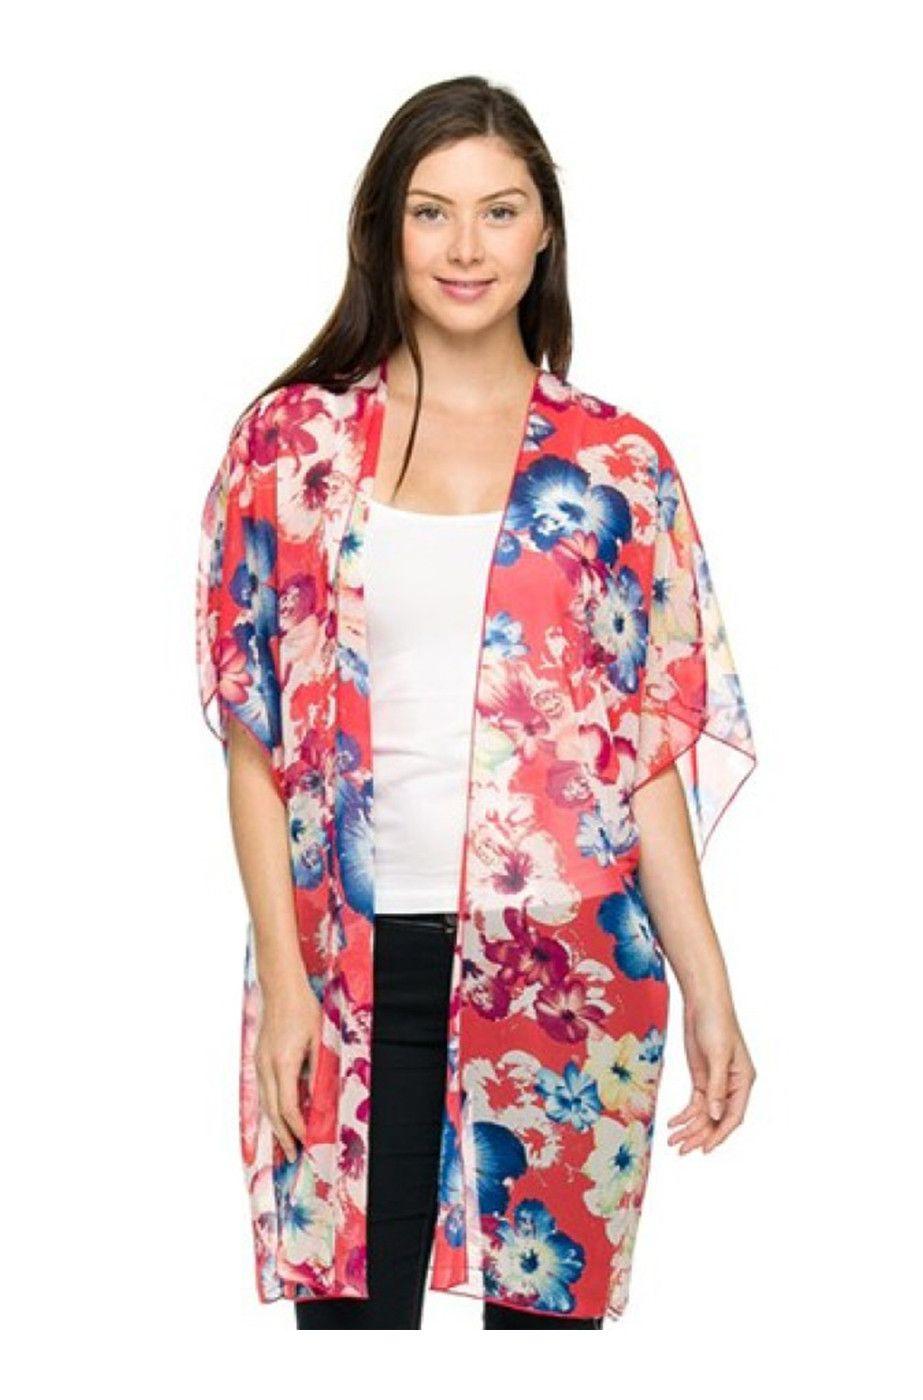 Coral & Blue 3/4 Sleeve Floral Print Kimono Cardigan | Cute Kimono ...